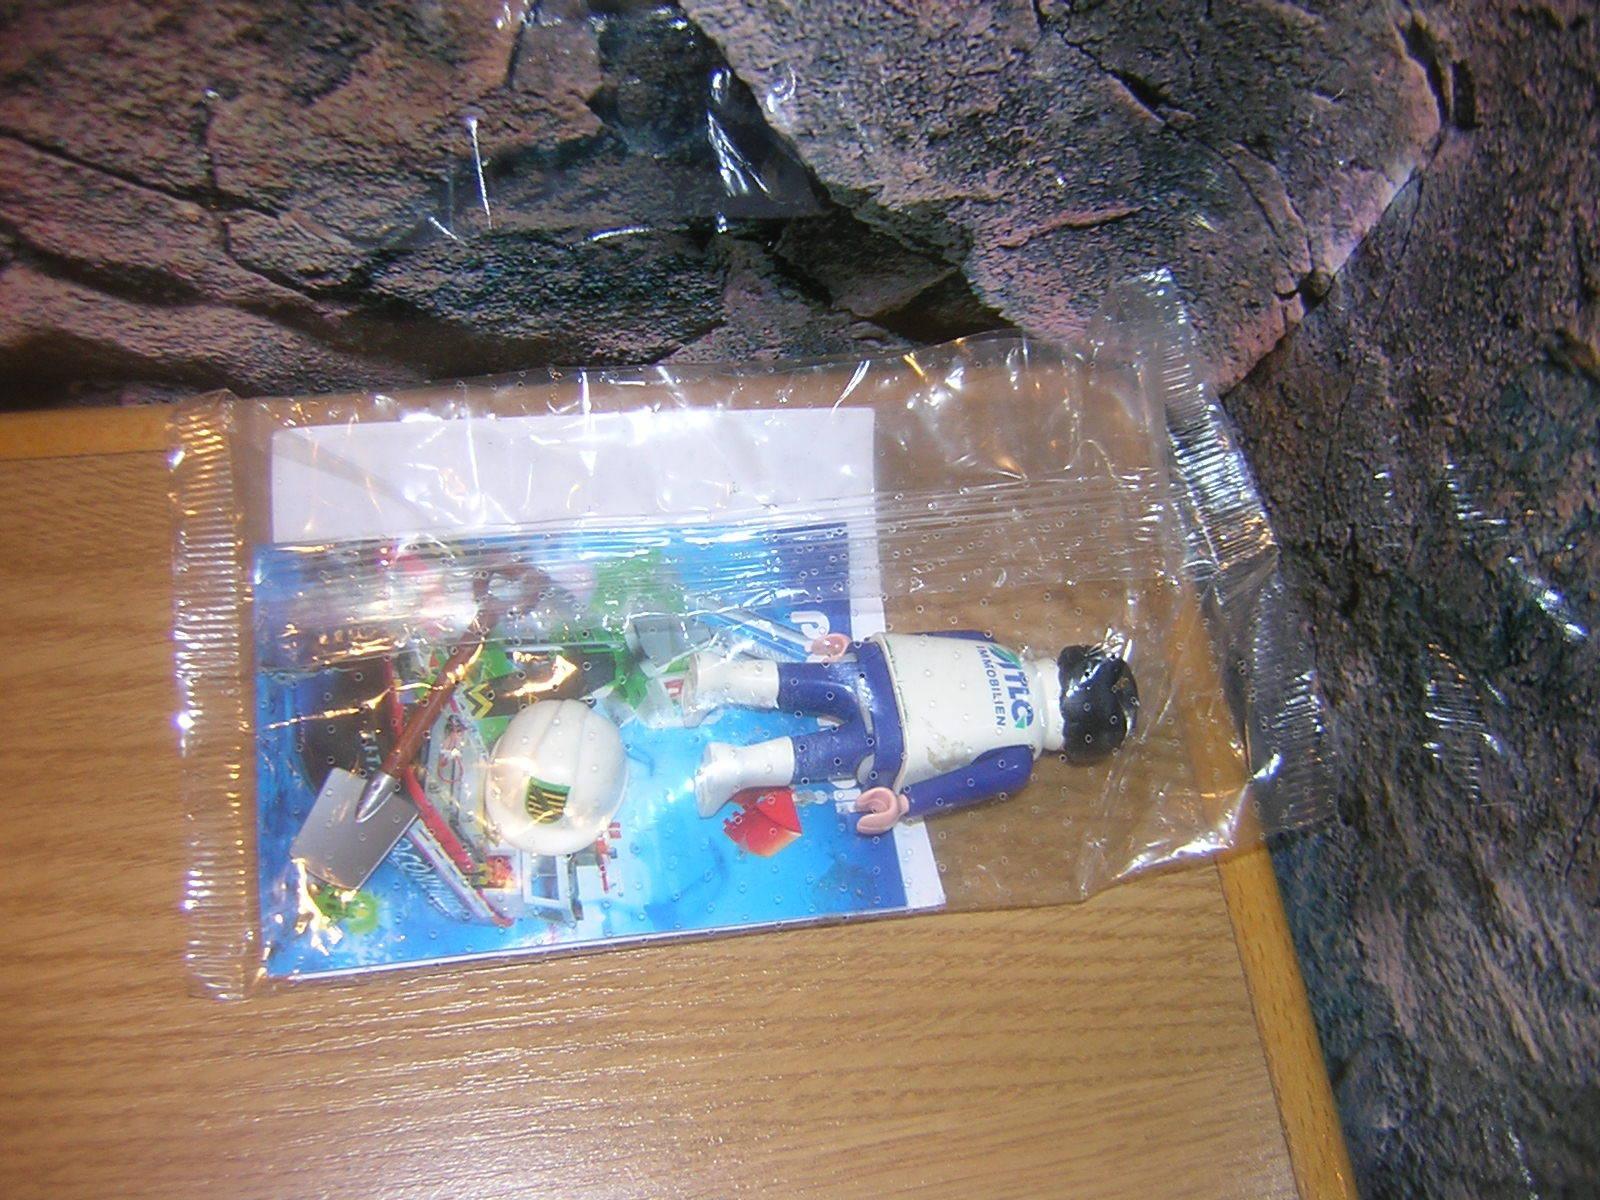 (A 3 1) pces Immobilien OUVRIER promo figurine Figurine Spéciale NEUF